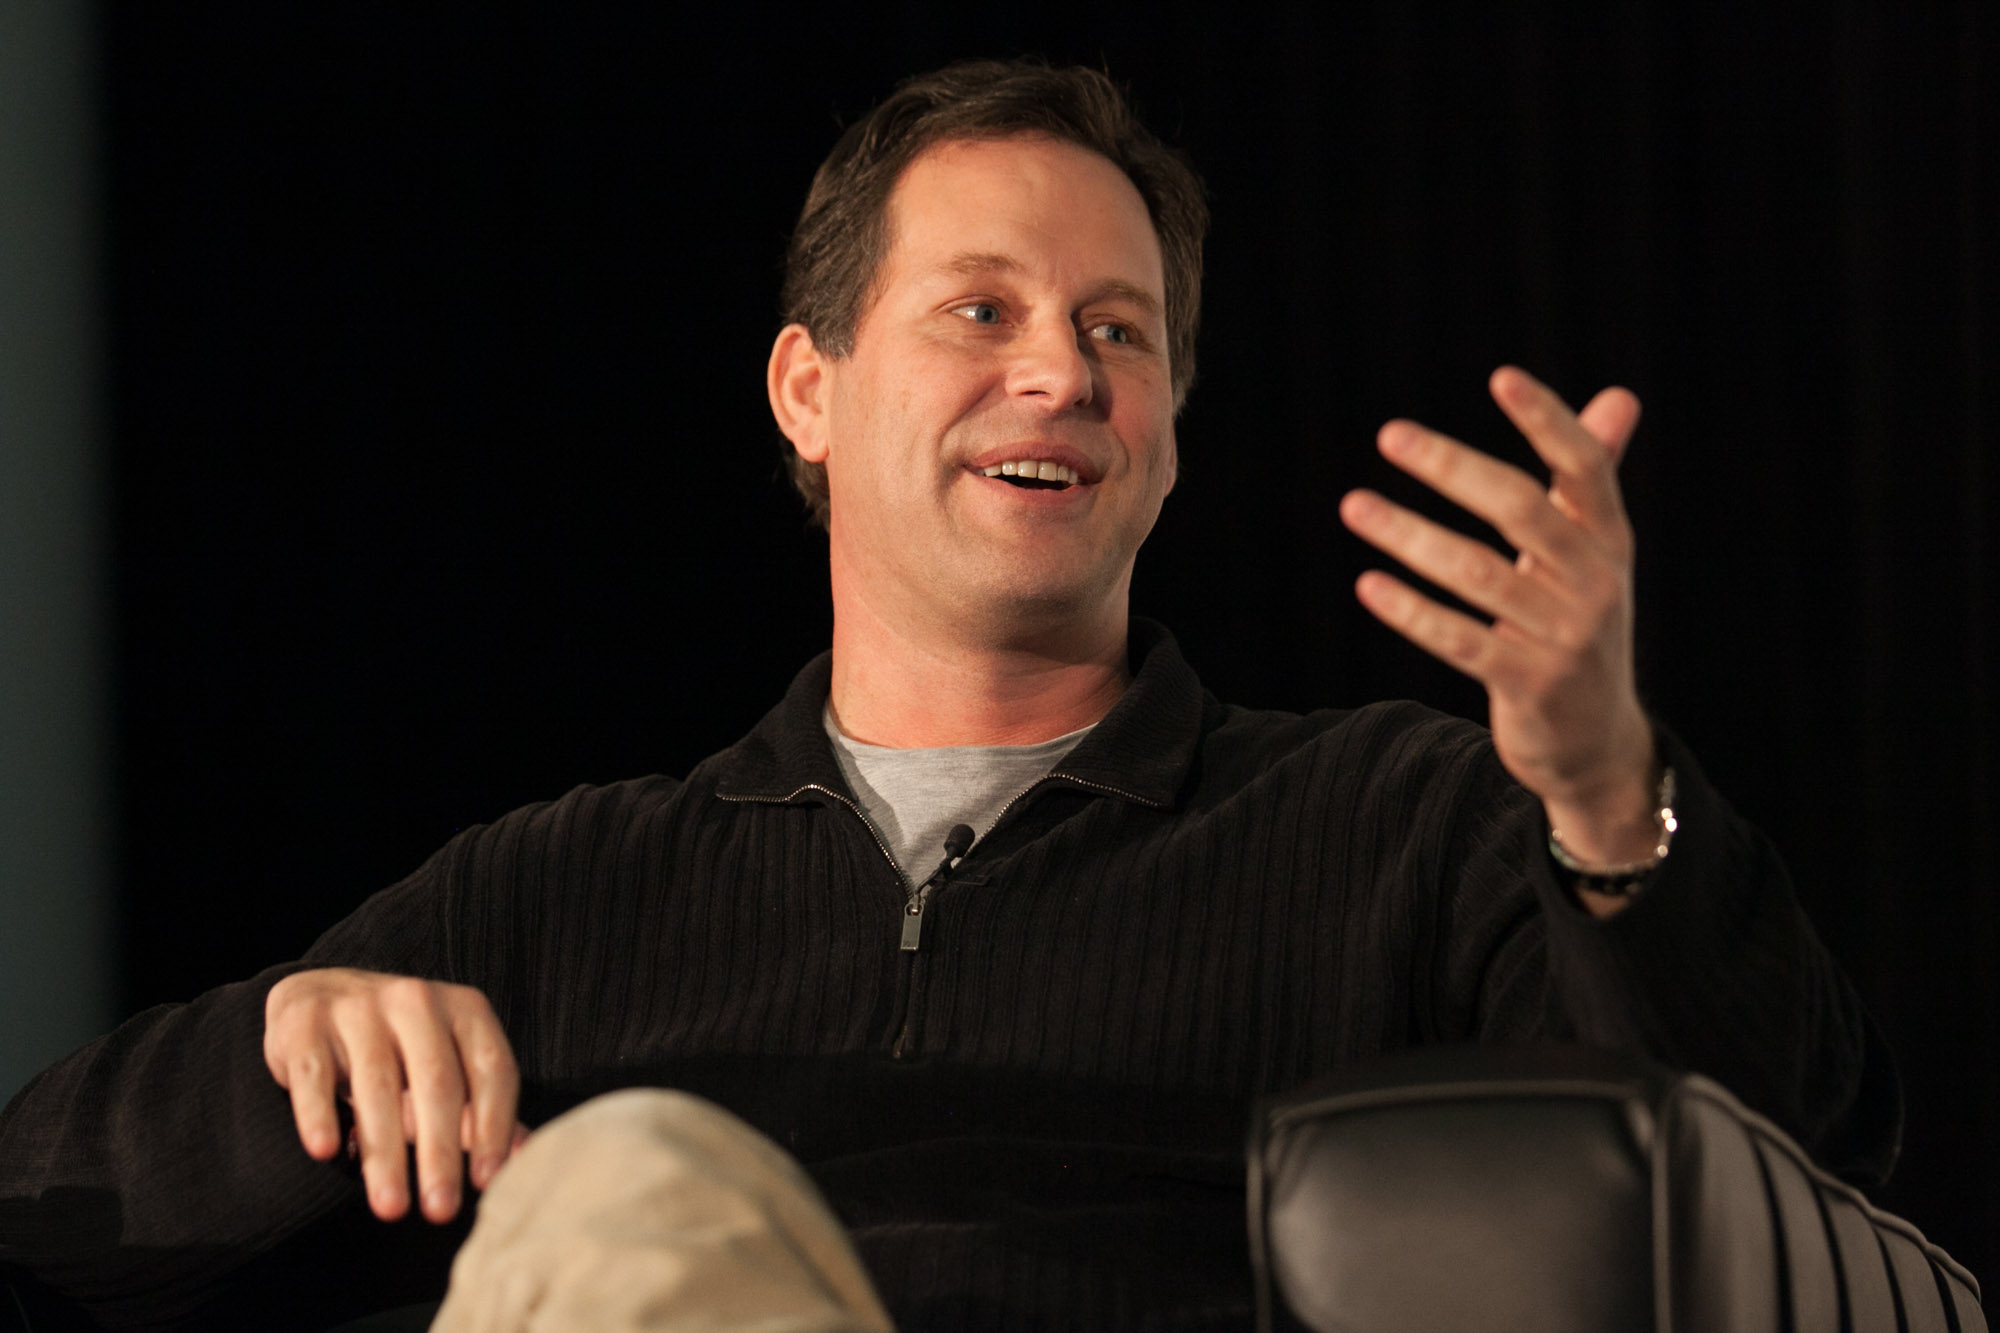 Mike Maples, Floodgate Ventures, at Startup Grind 2014